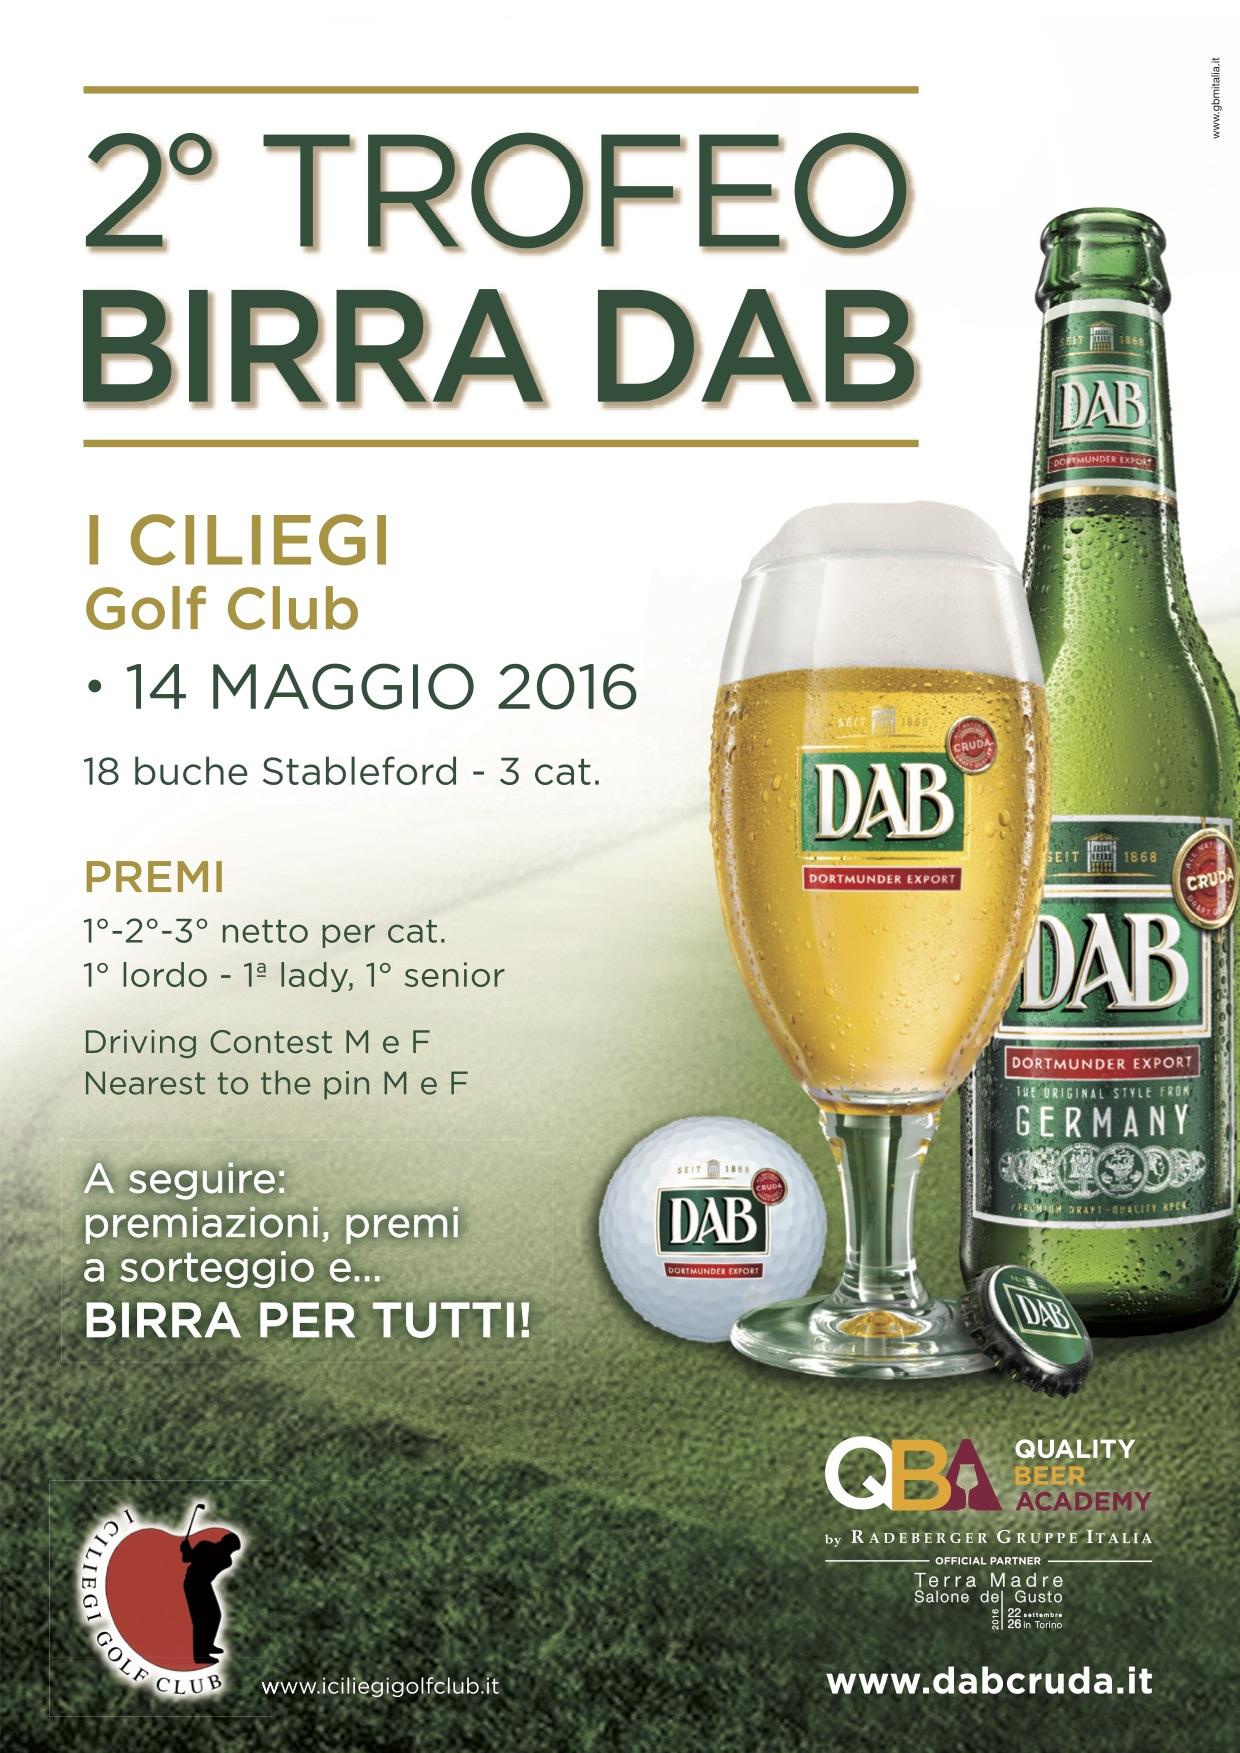 Trofeo birra DAB 2016 Ciliegi